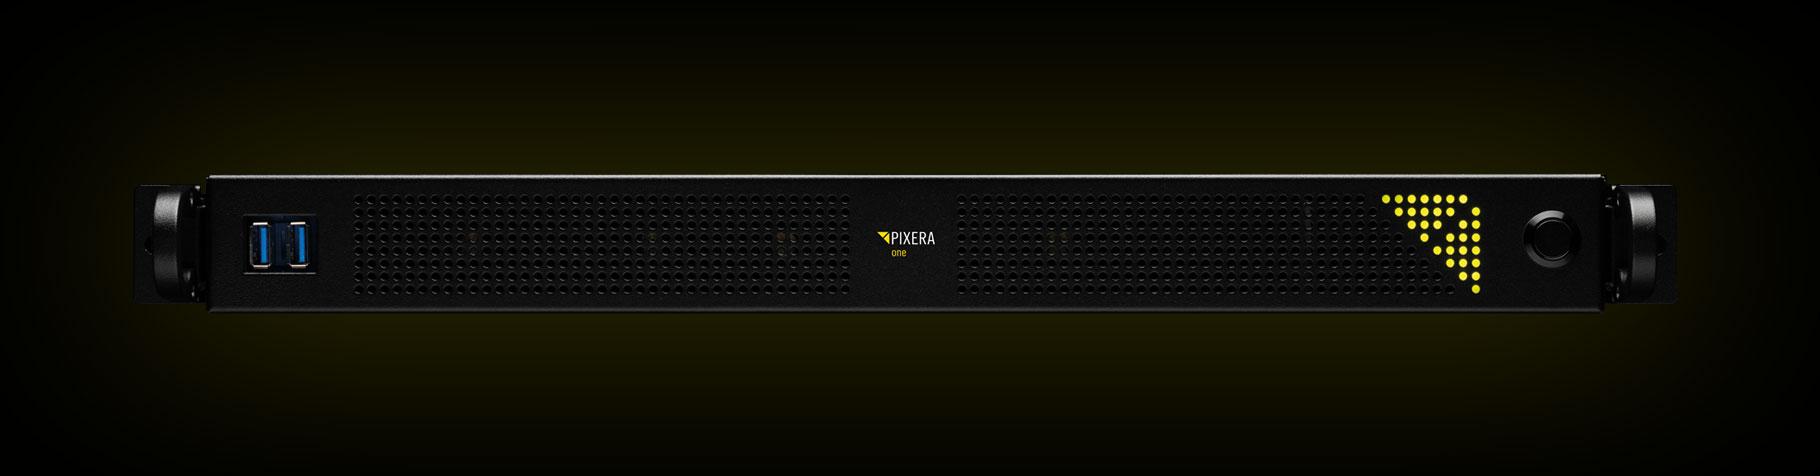 AV Stumpfl PIXERA one - Medienserver (Neuware) kaufen